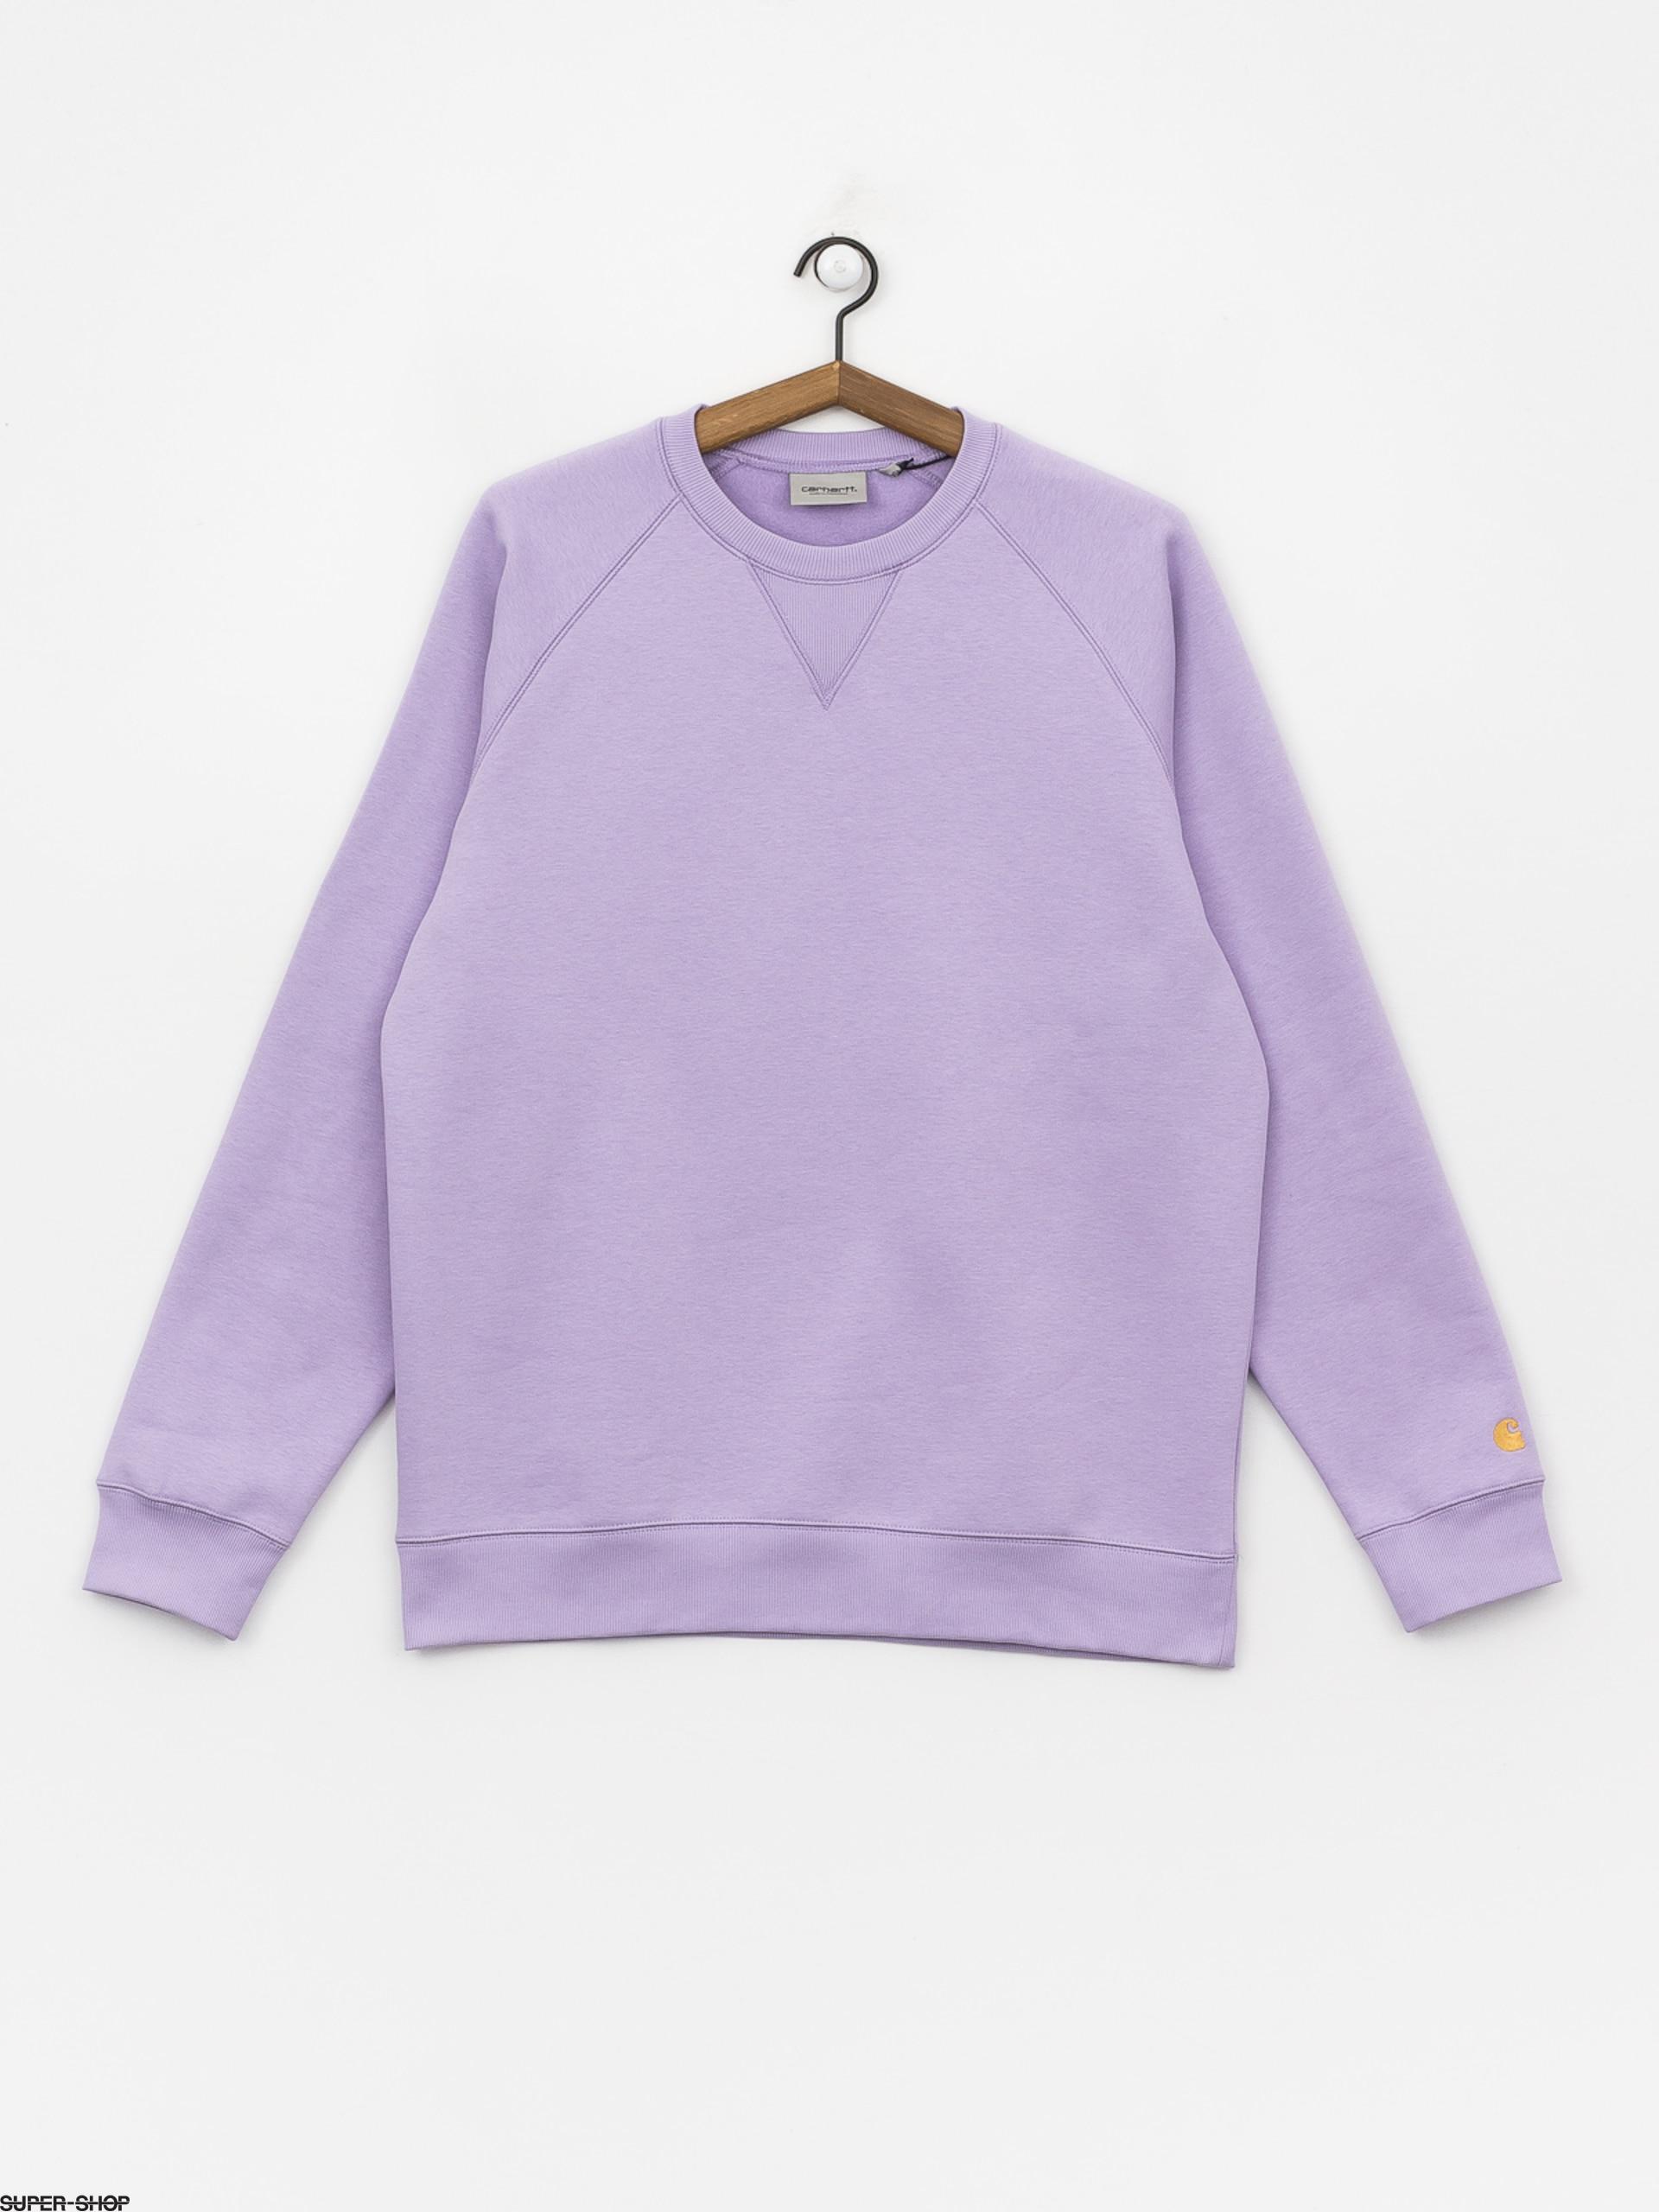 5815db45328 1040635-w1920-carhartt-wip-chase-sweatshirt-soft-lavender-gold.jpg